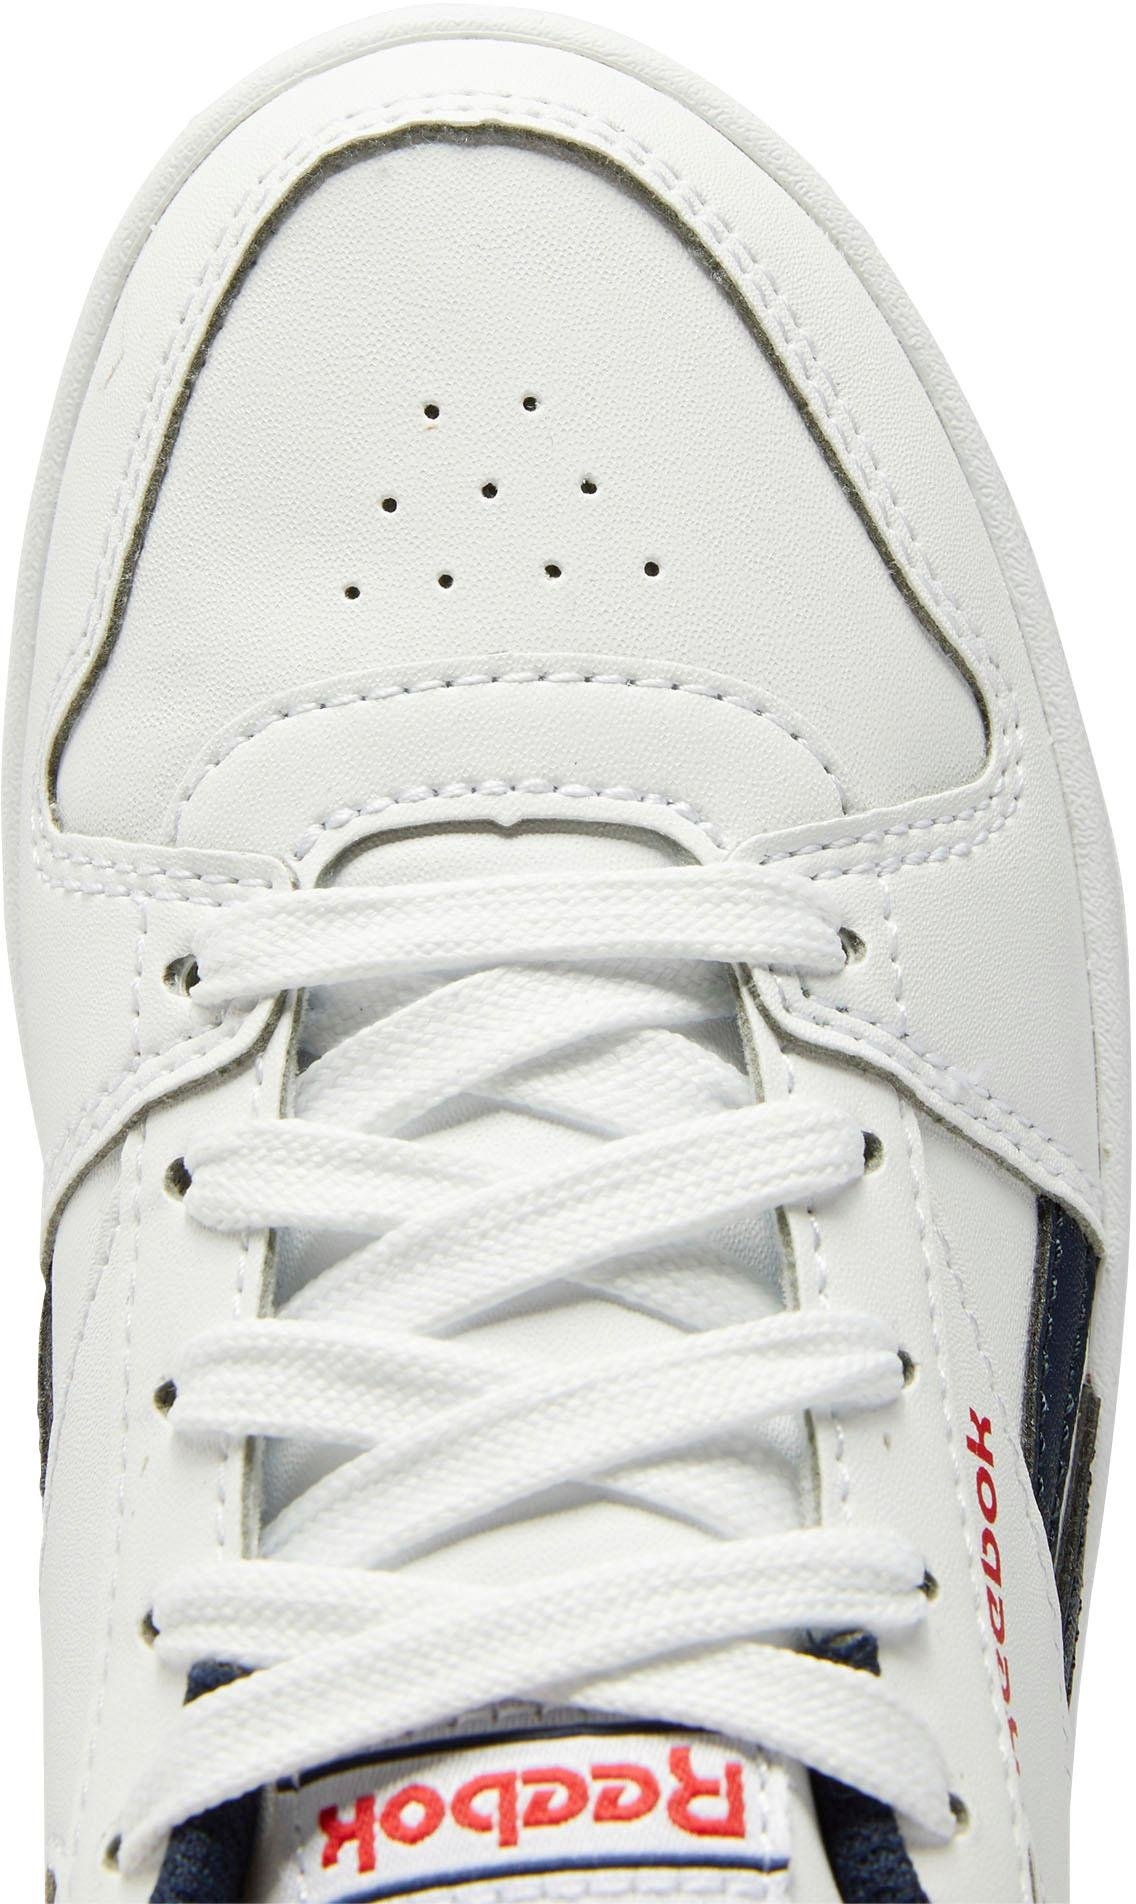 Reebok sneakers »REEBOK ROYAL PRIME« bestellen: 30 dagen bedenktijd